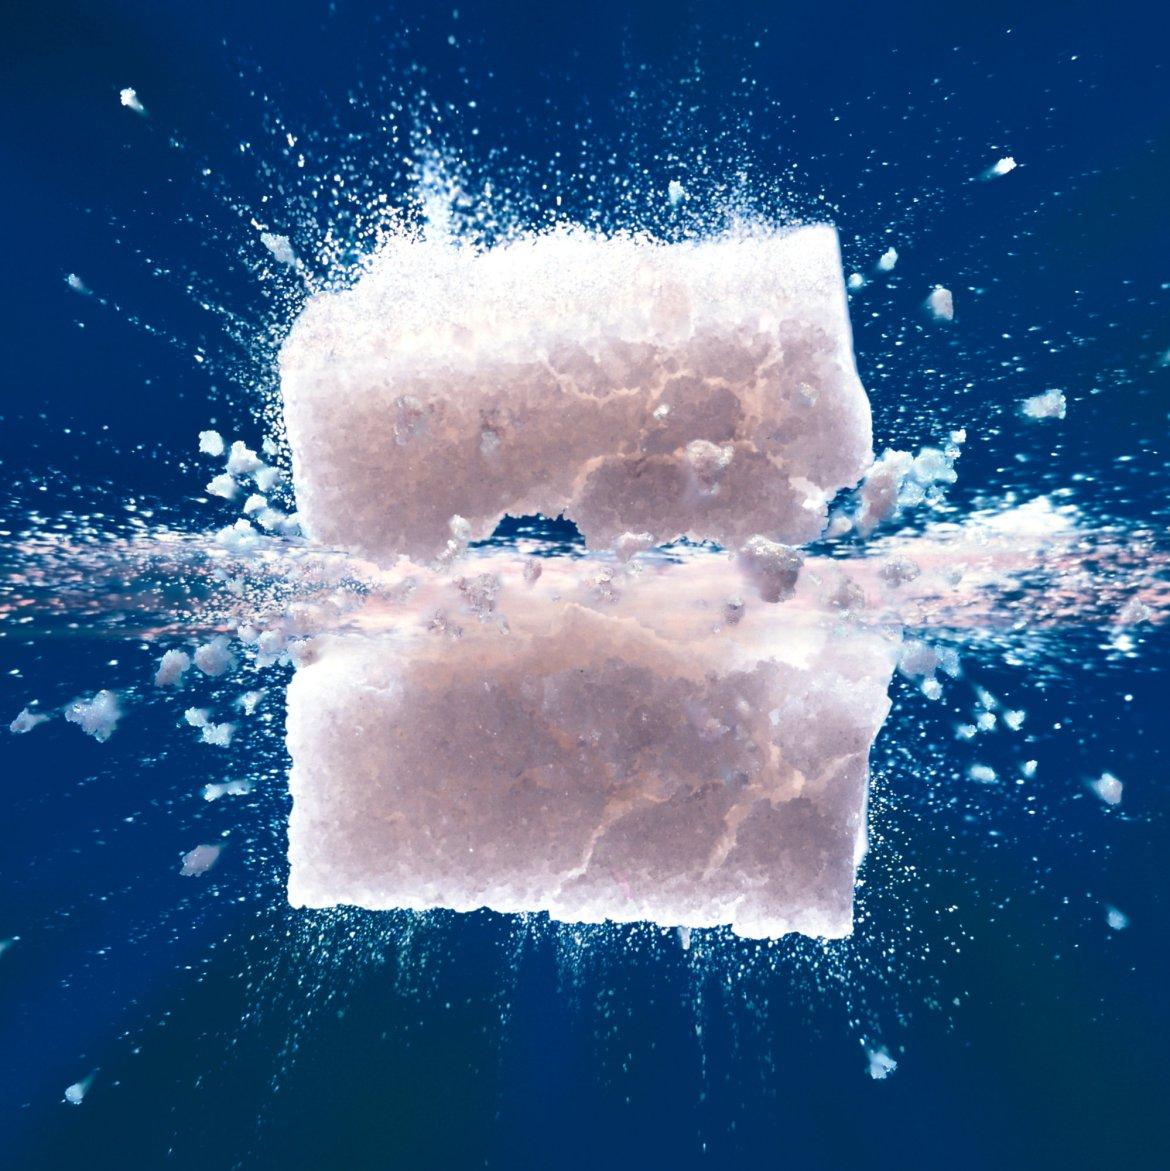 Sugar cube bursting